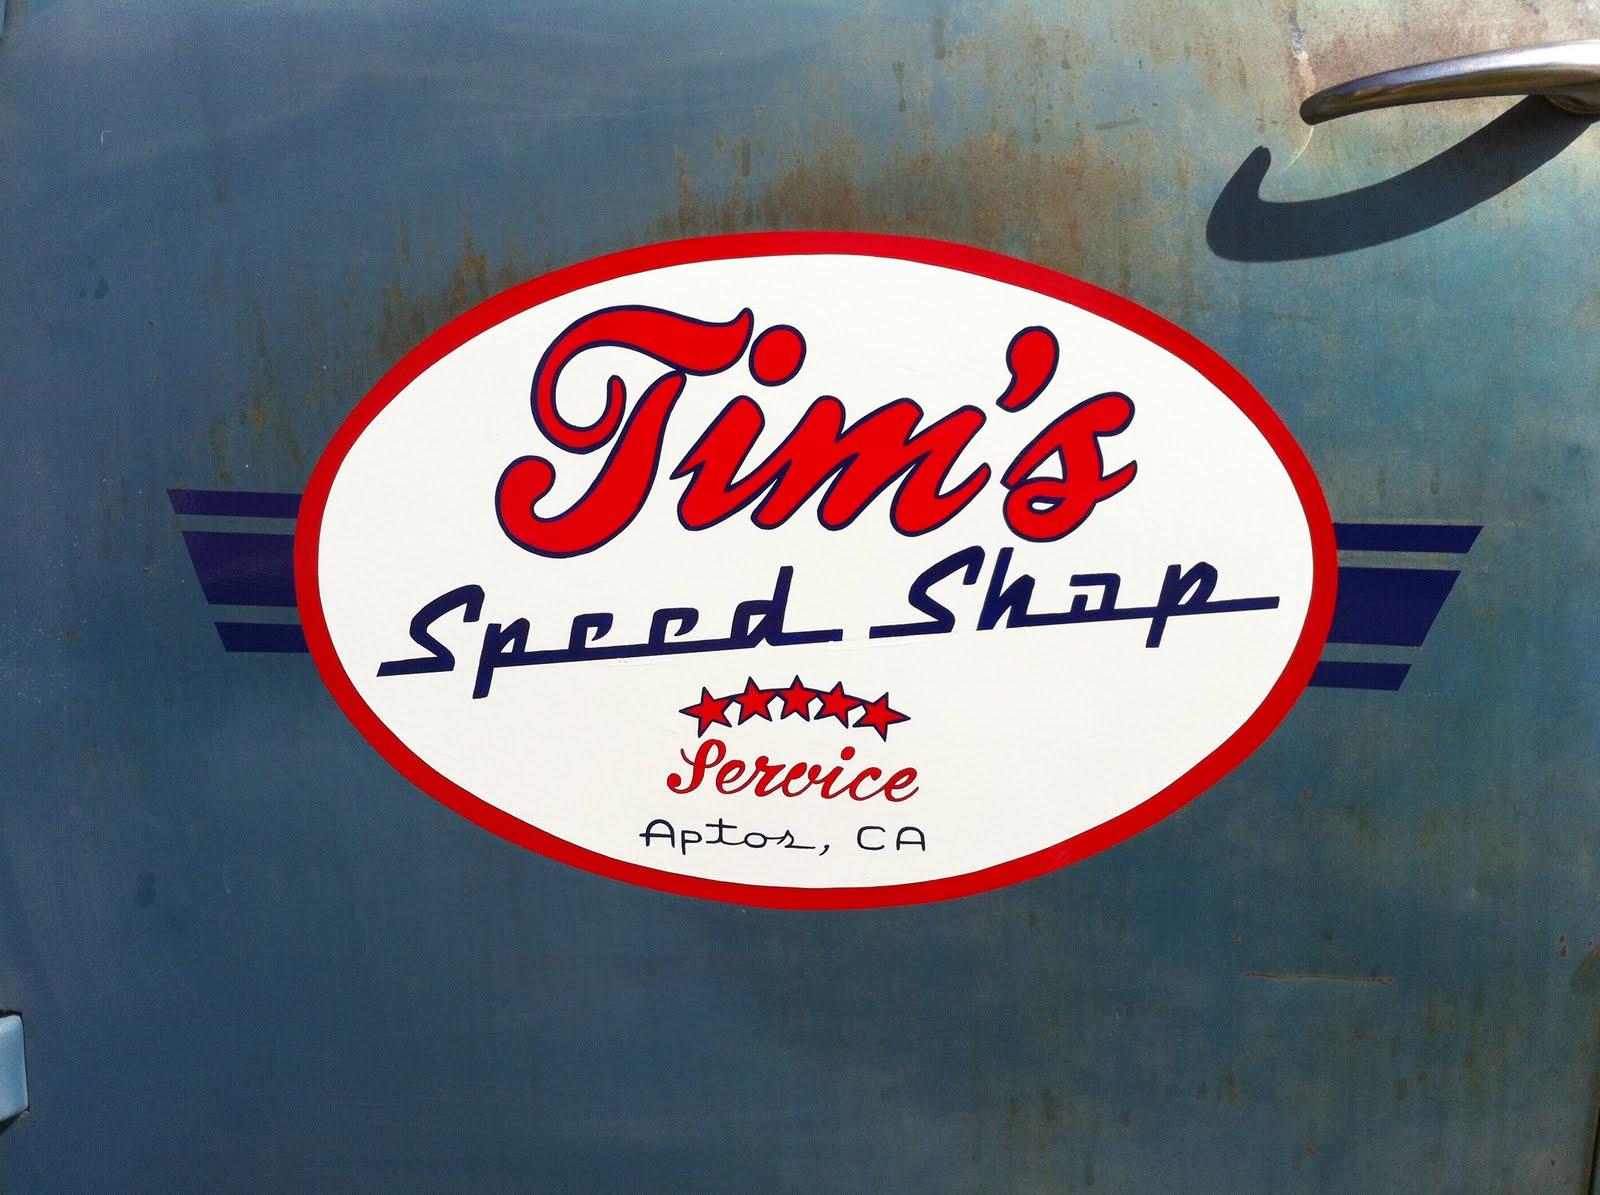 tims machine shop